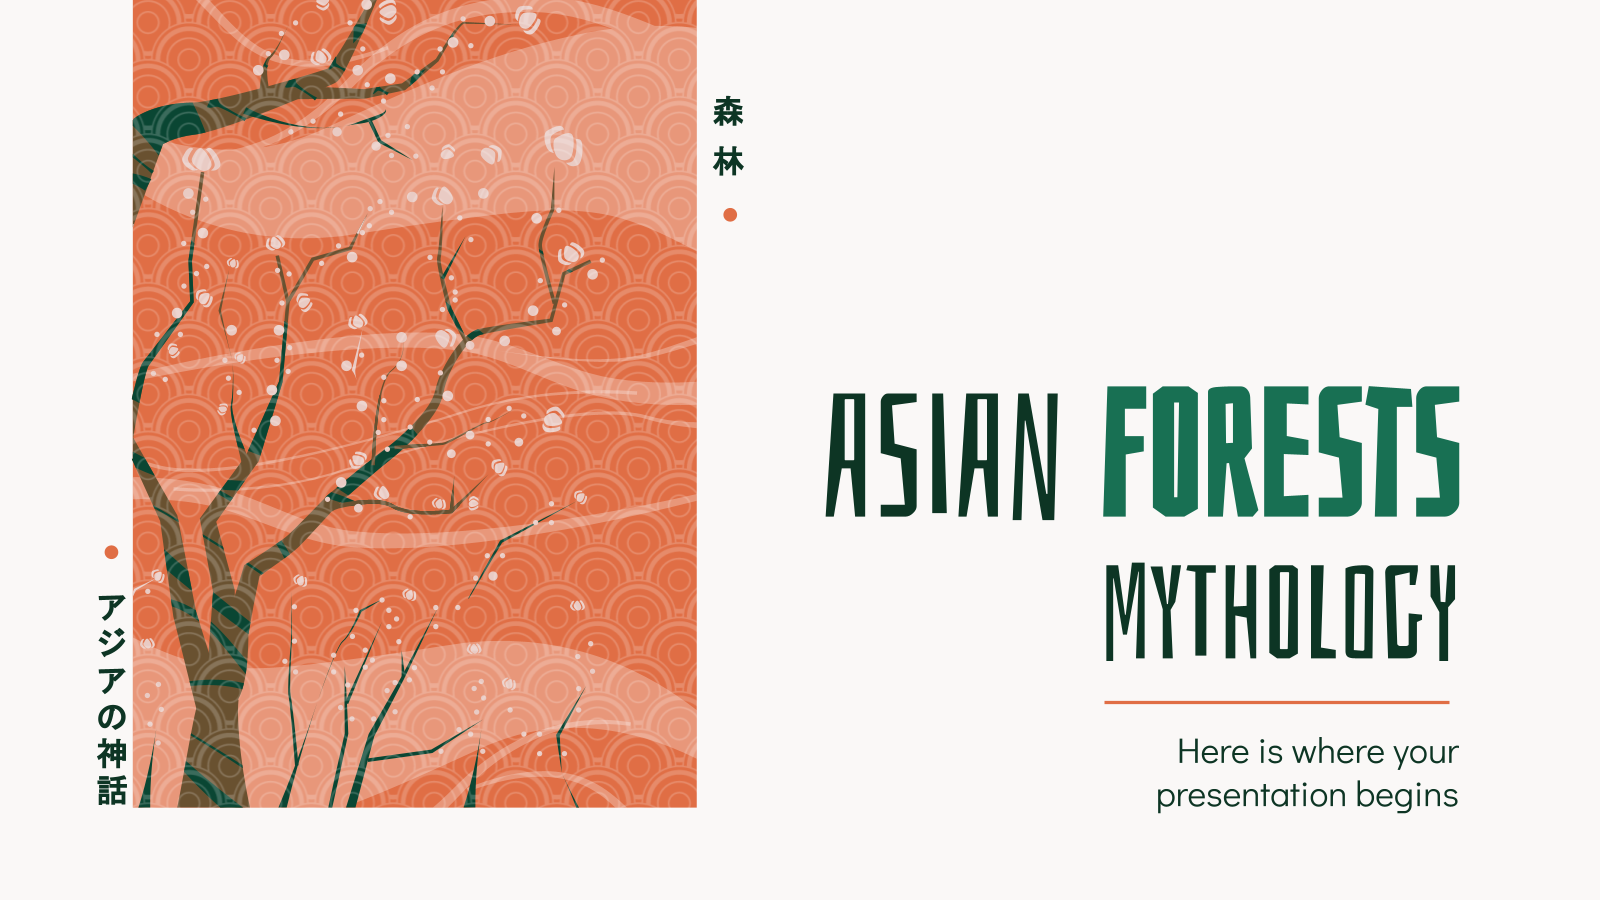 Asian Forests Mythology presentation template